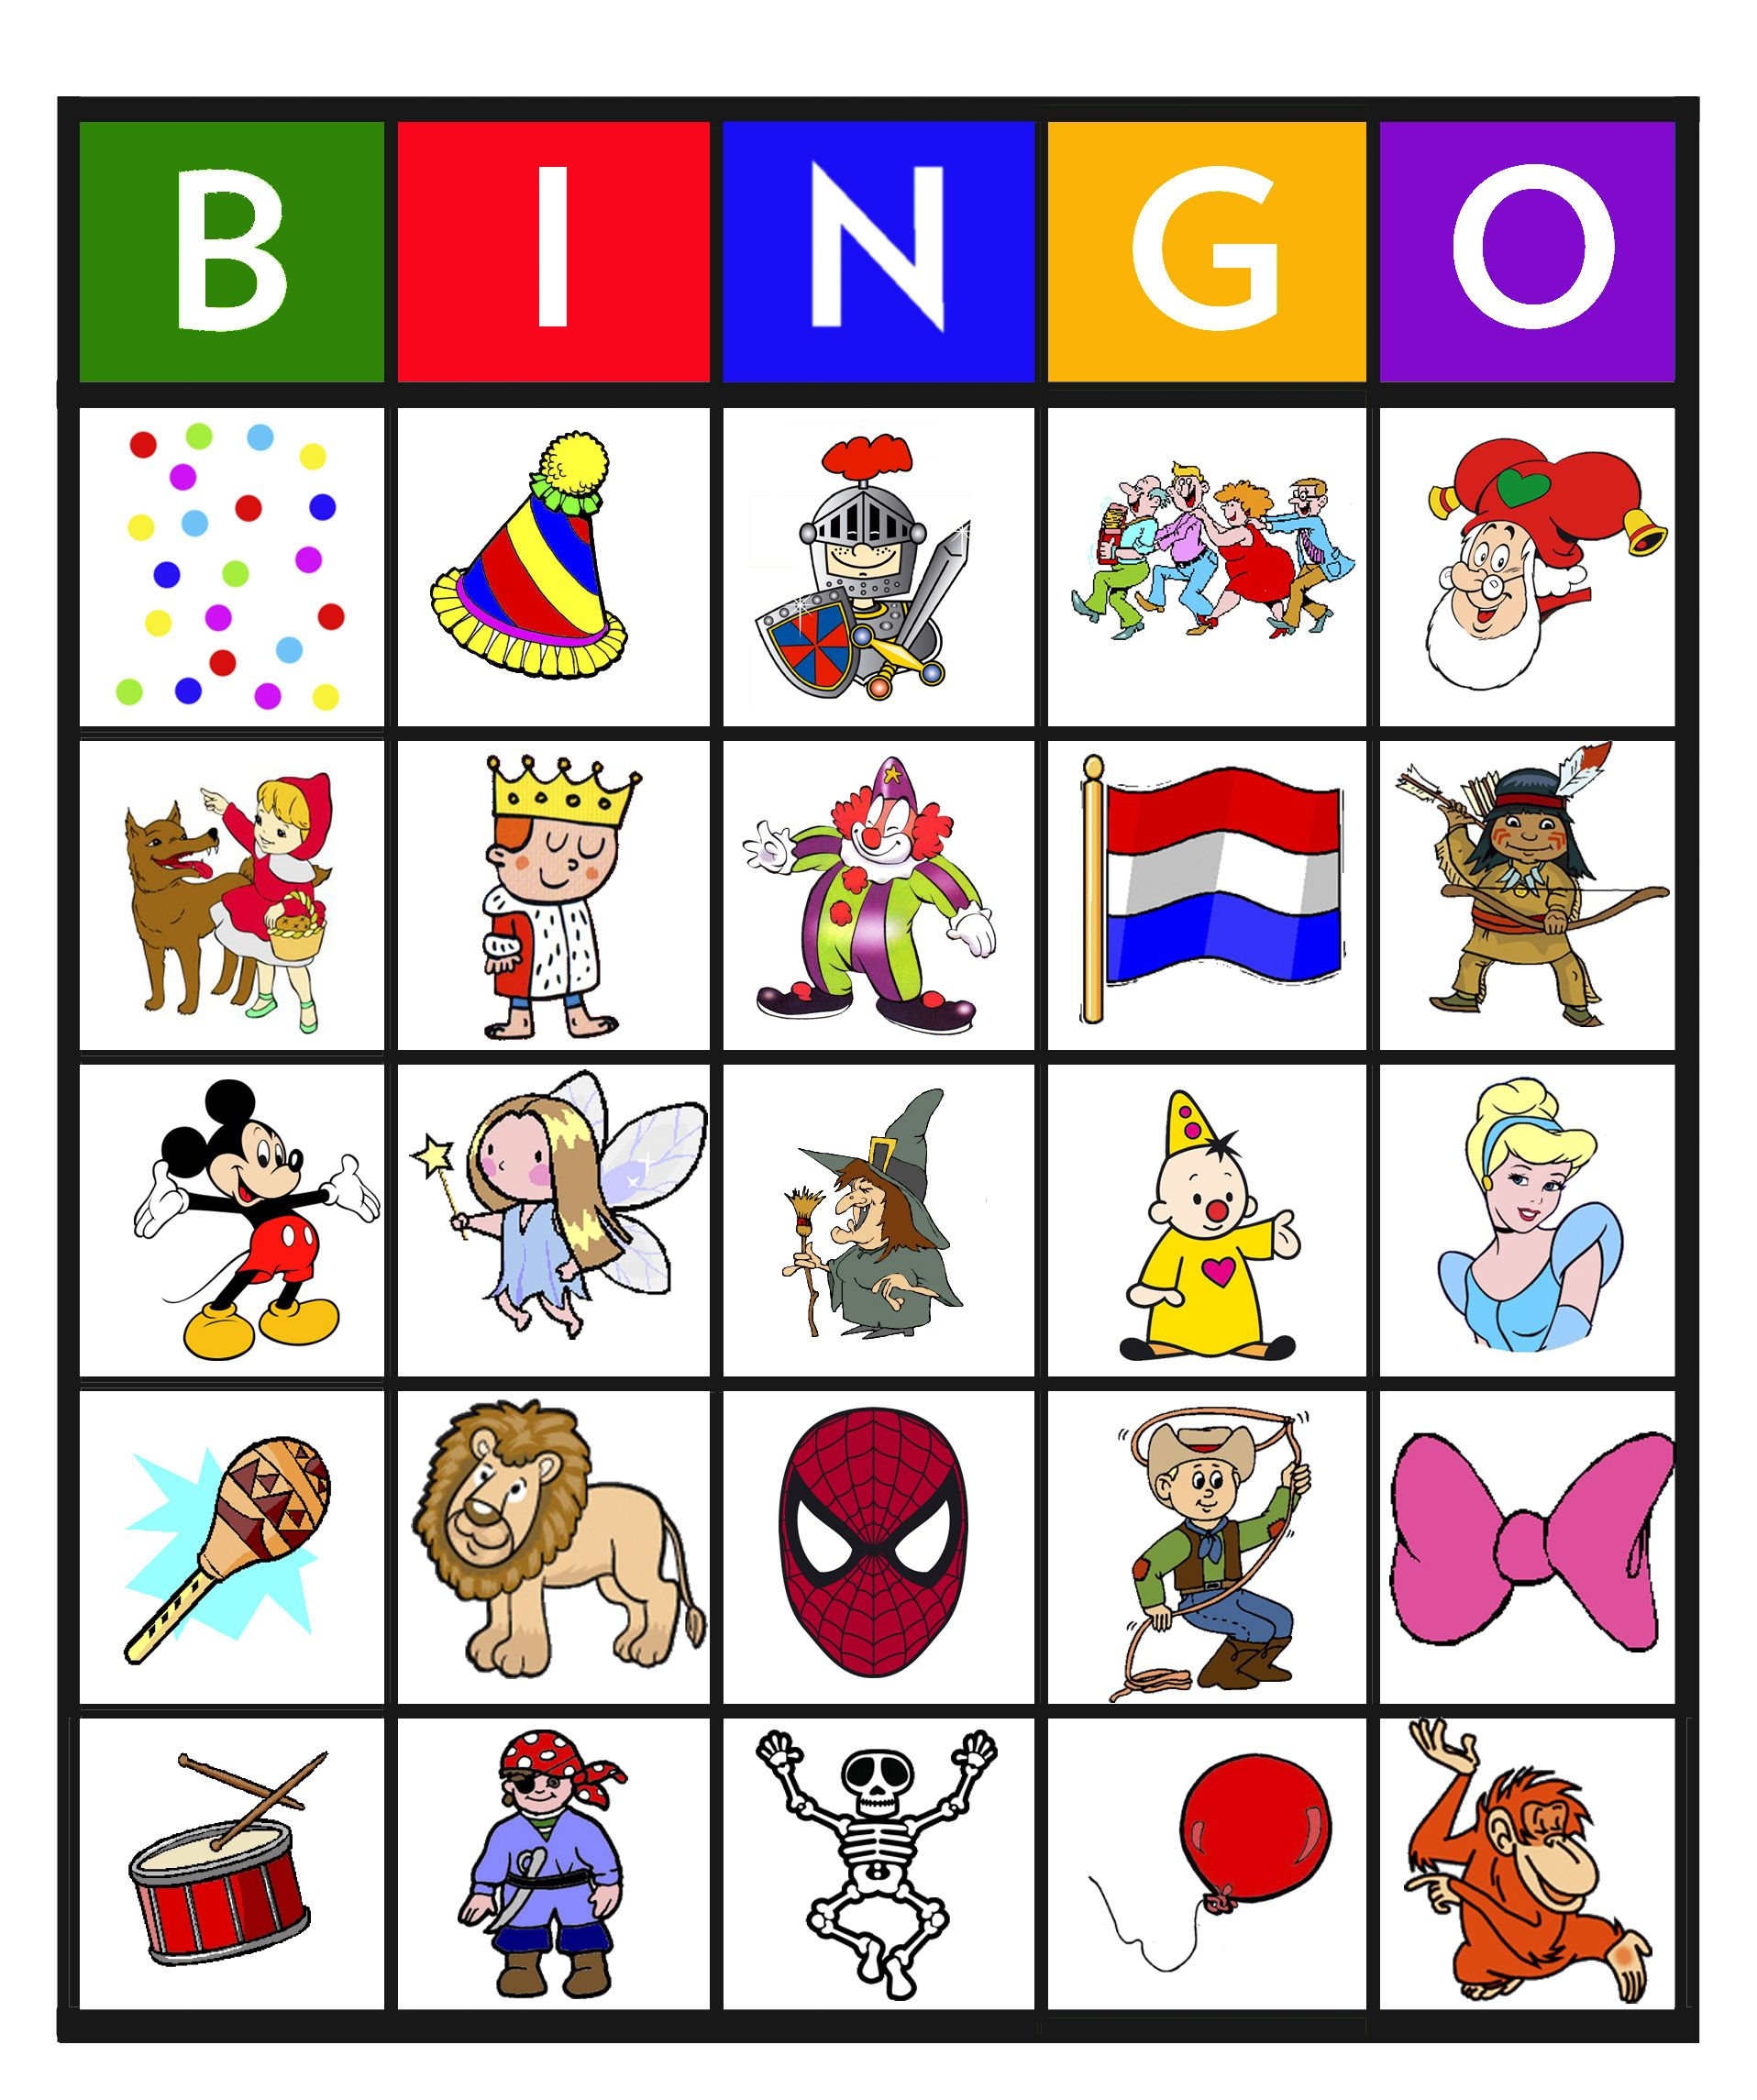 Super Bingo: carnaval 4 | bingo | Carnaval, Carnaval spelletjes @CK89